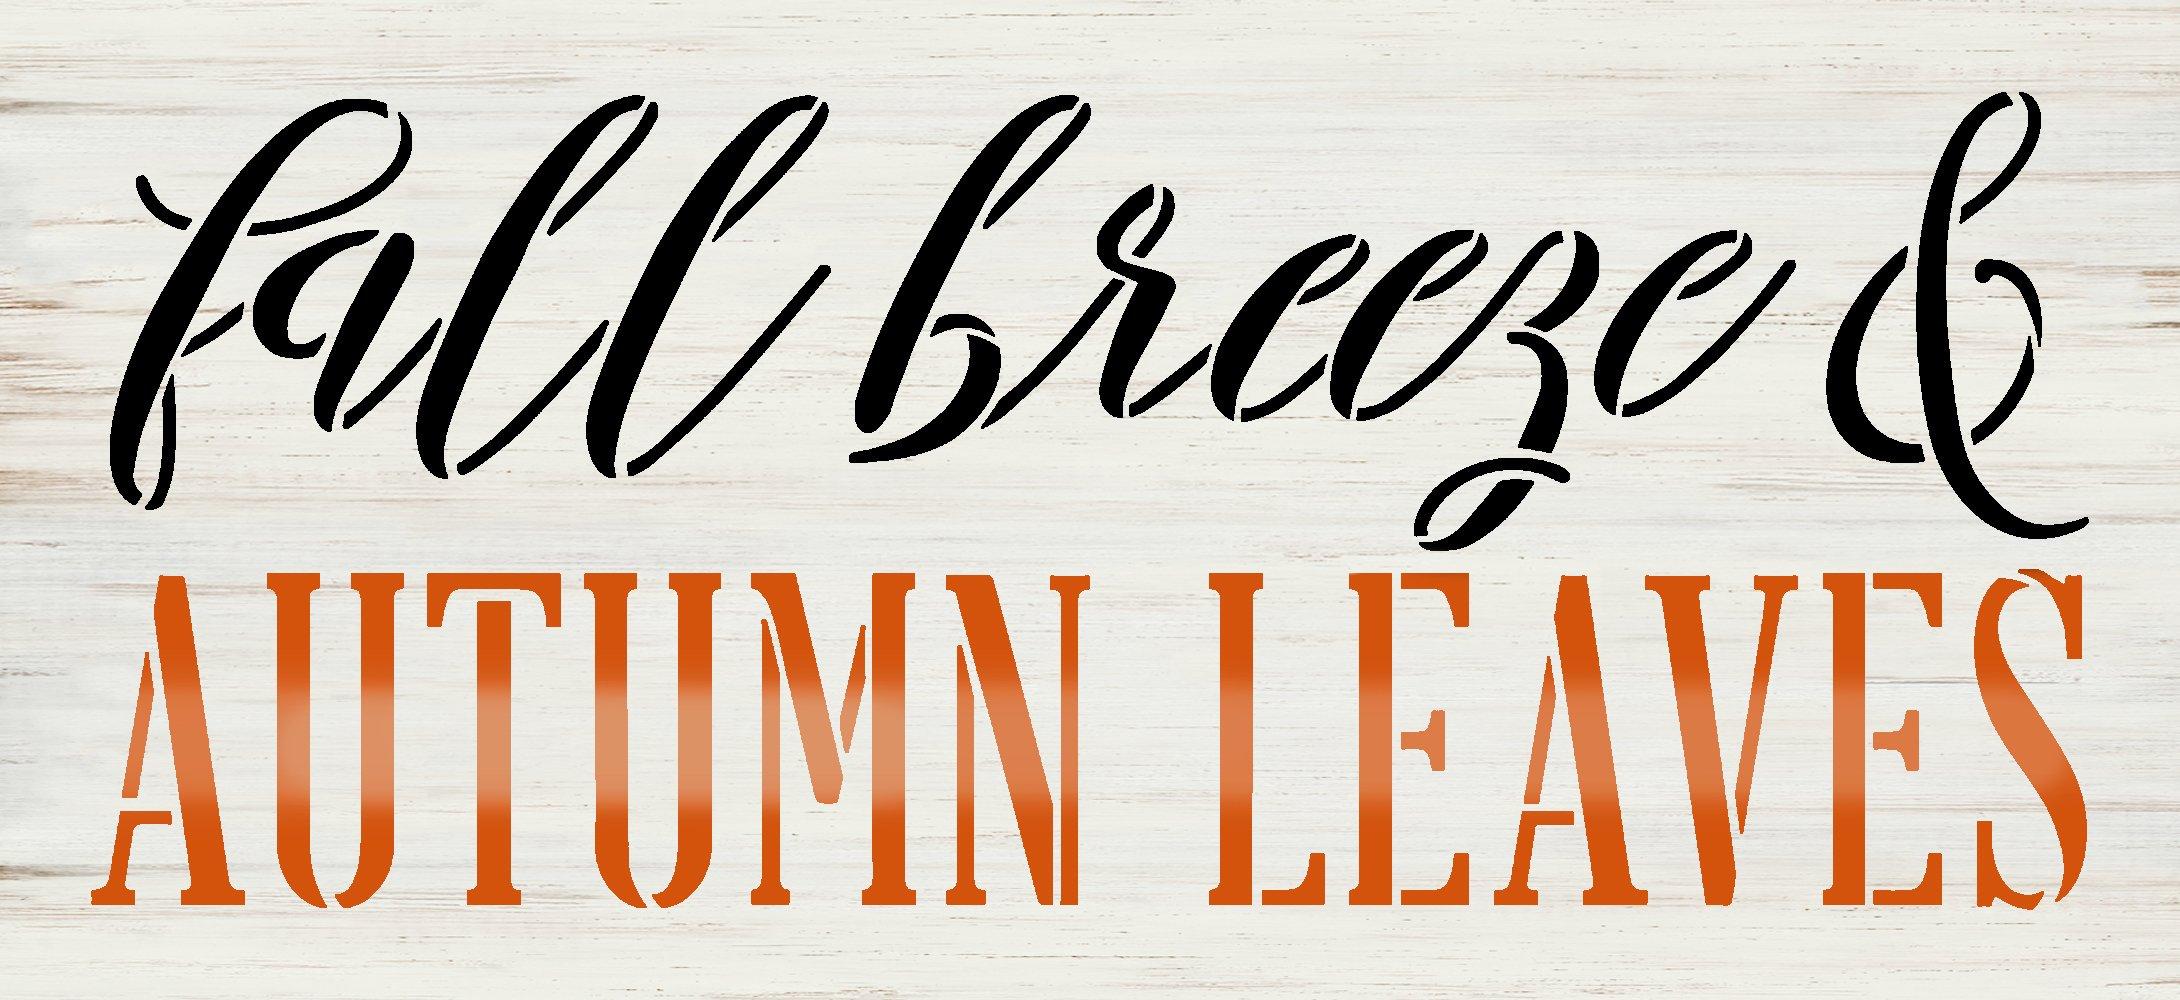 Fall Breeze & Autumn Leaves Stencil by StudioR12   Craft DIY Farmhouse Cursive Home Decor   Paint Wood Sign   Reusable Mylar Template   Select Size